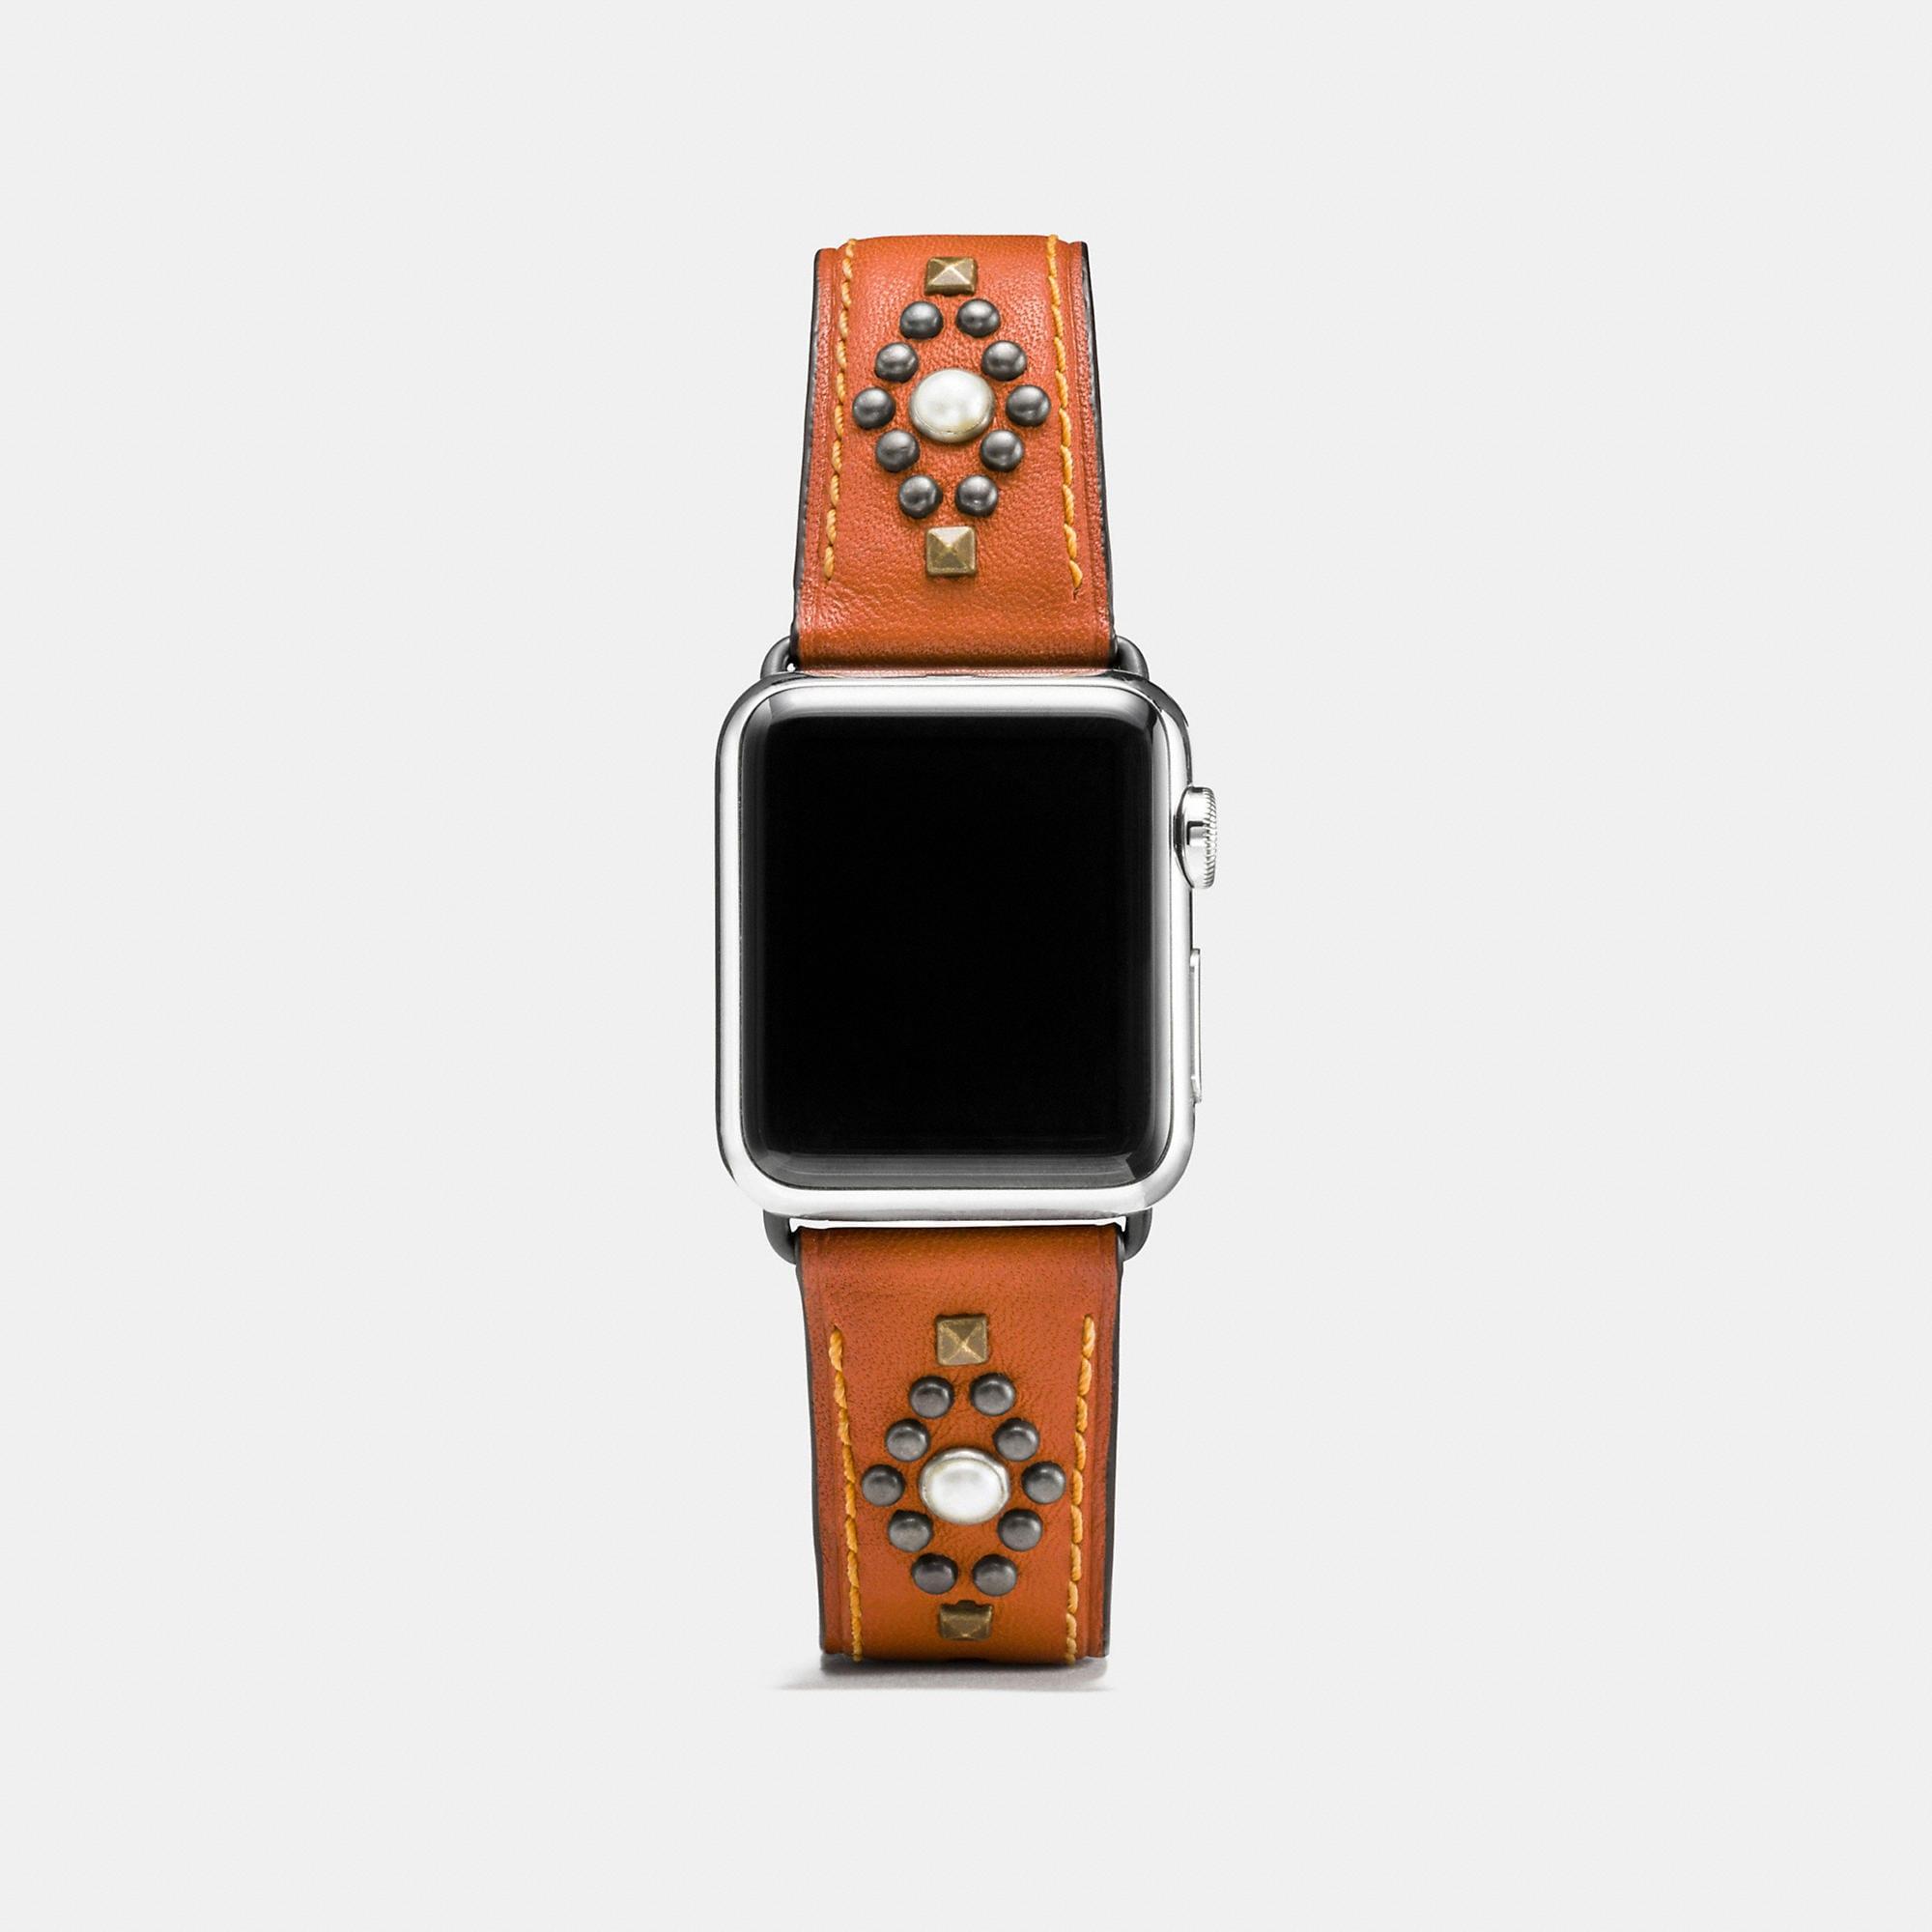 Coach Apple Watch Studs Leather Watch Strap